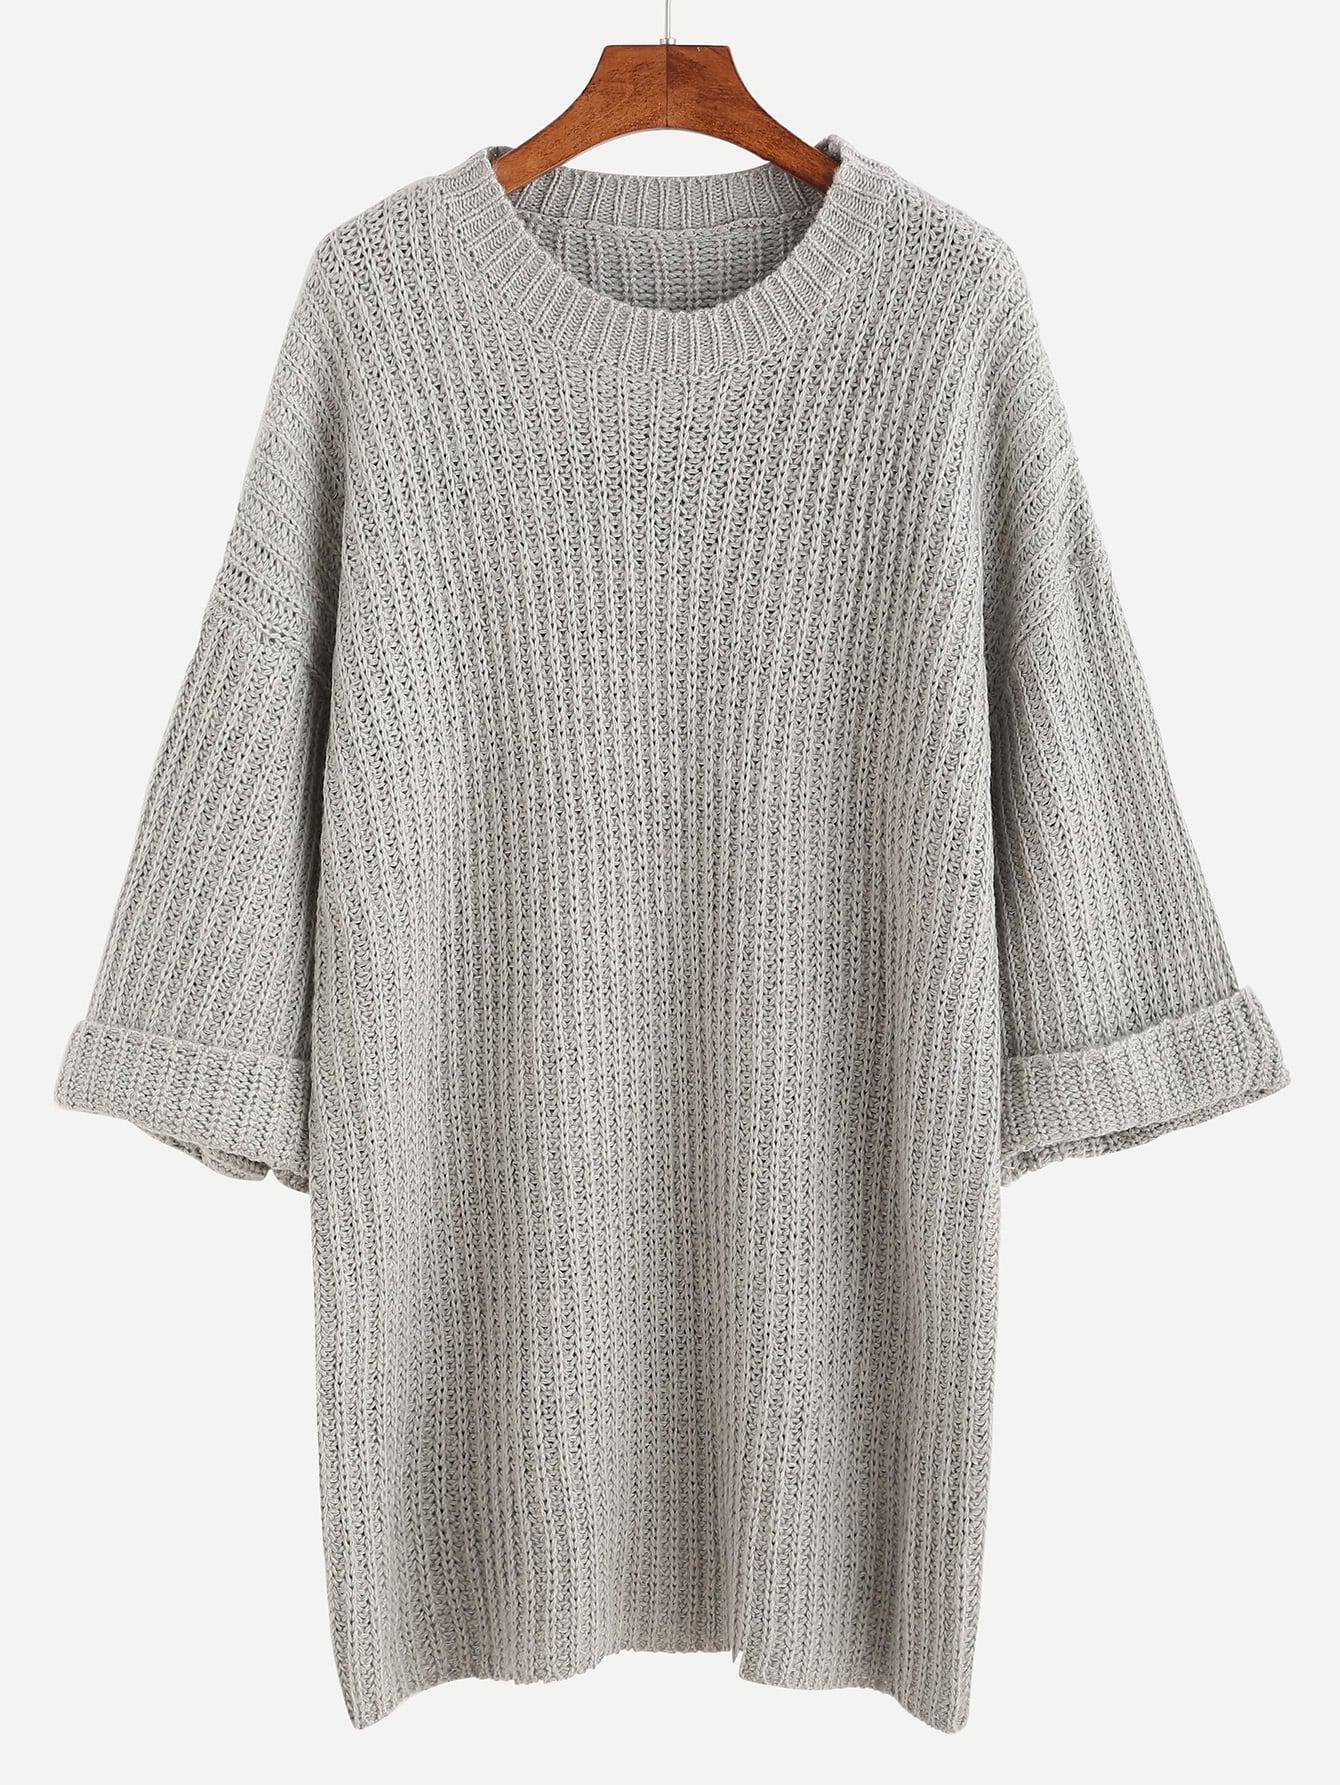 Grey Dropped Shoulder Seam Cuffed Sweater Dress